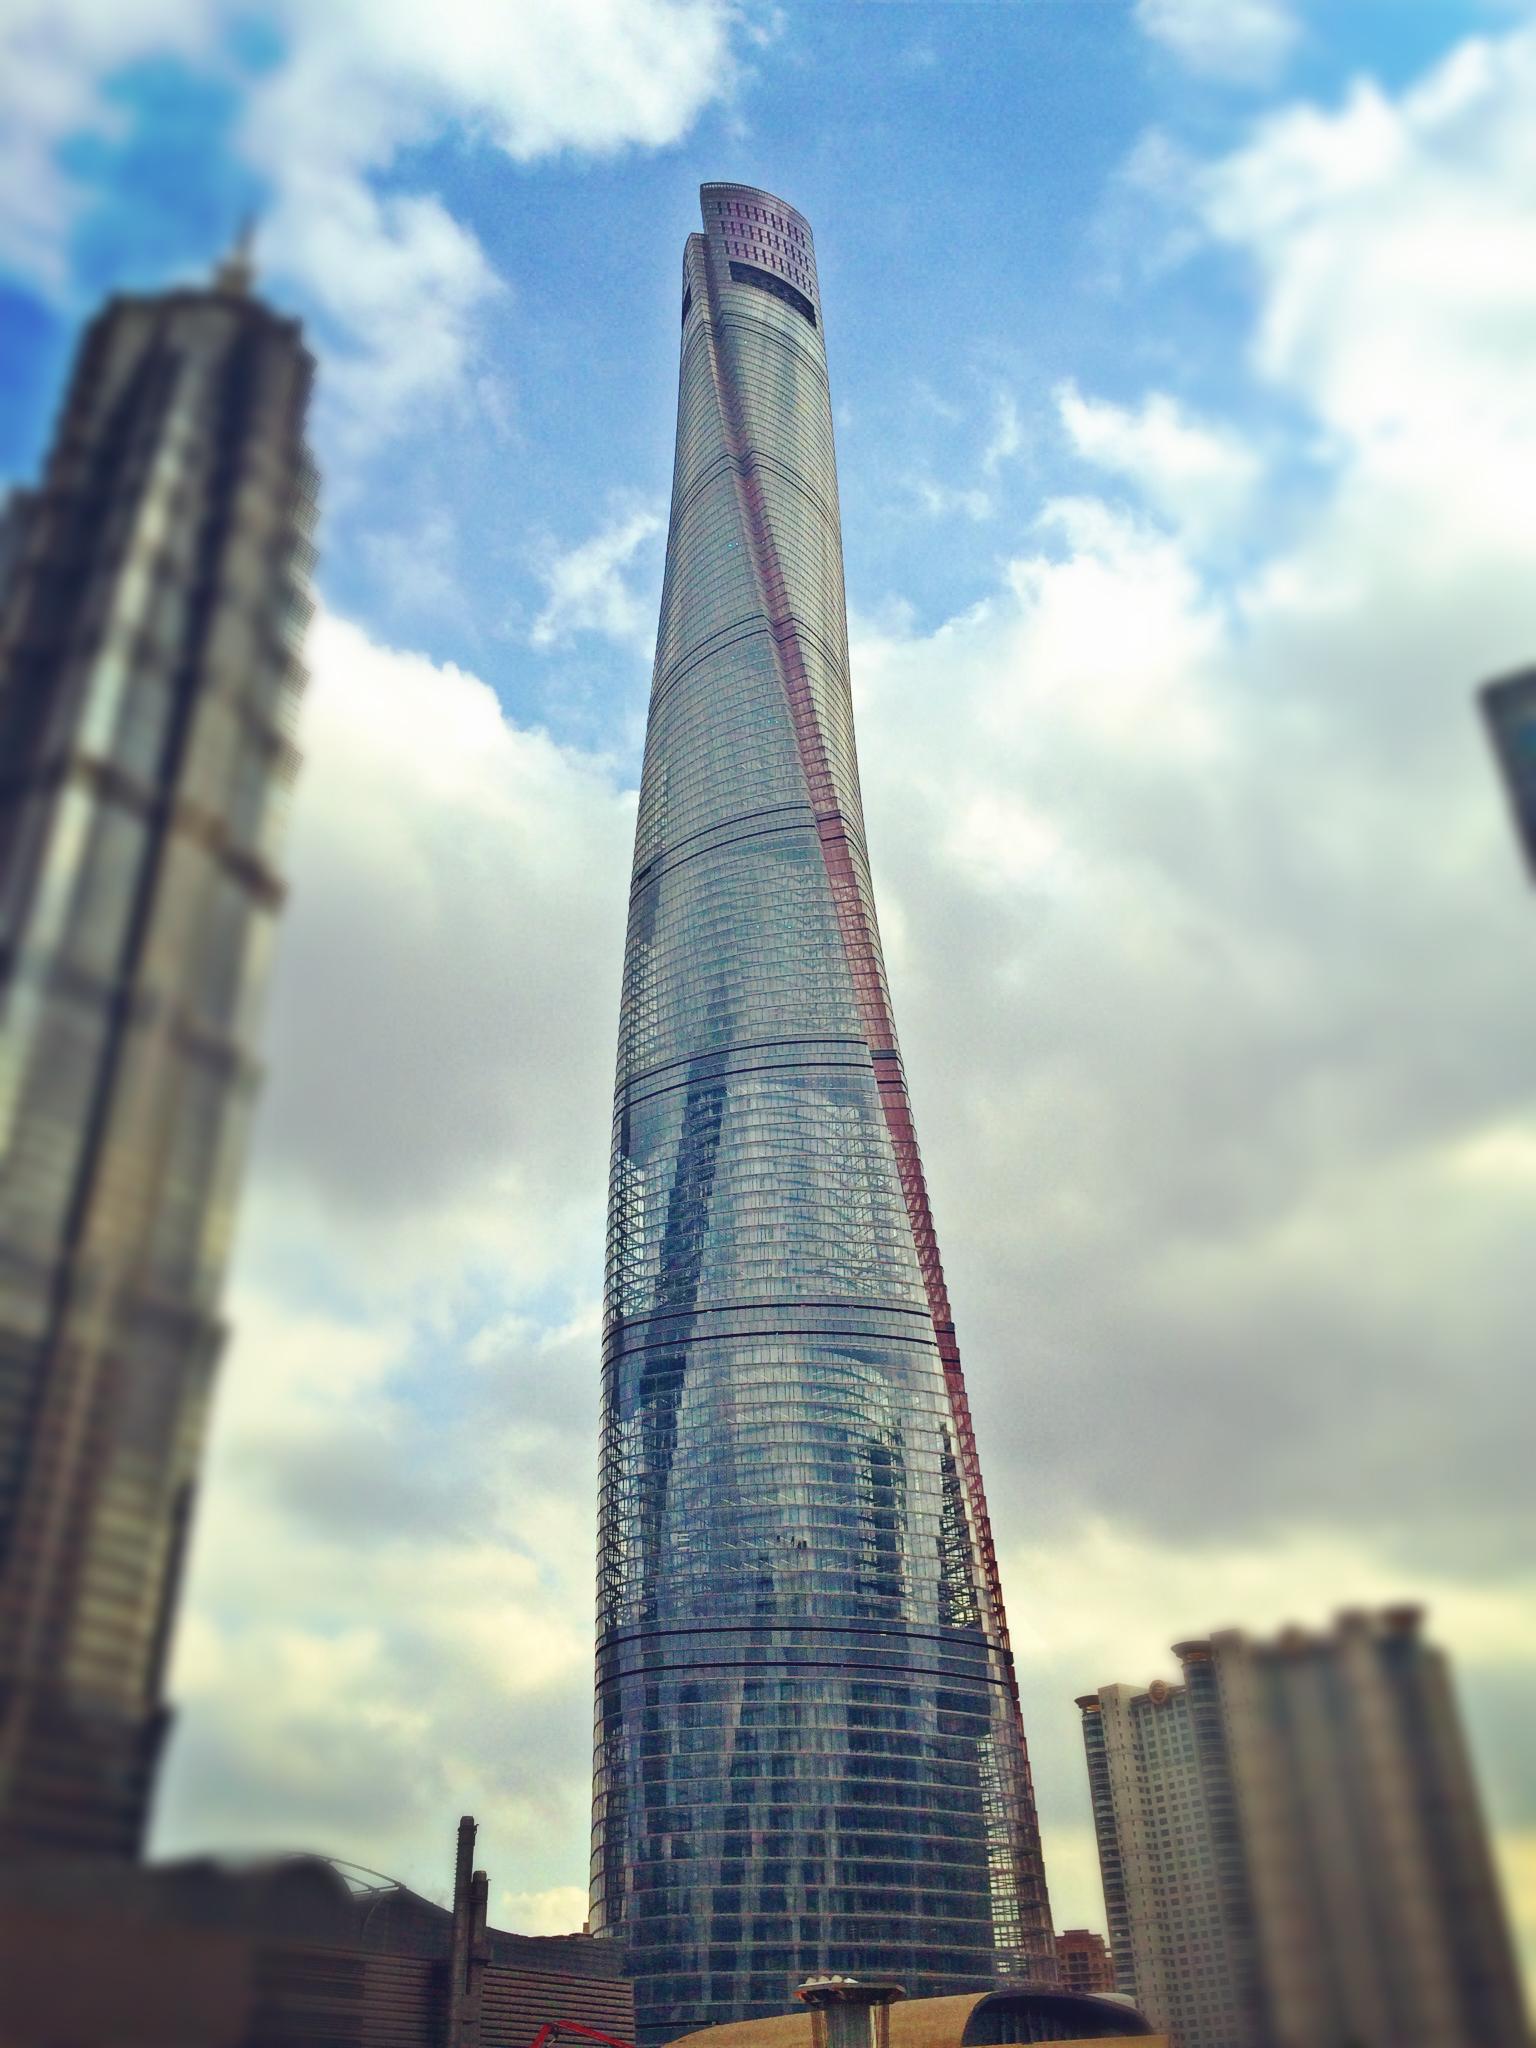 Shanghai tower dec 26, 2014.jpg